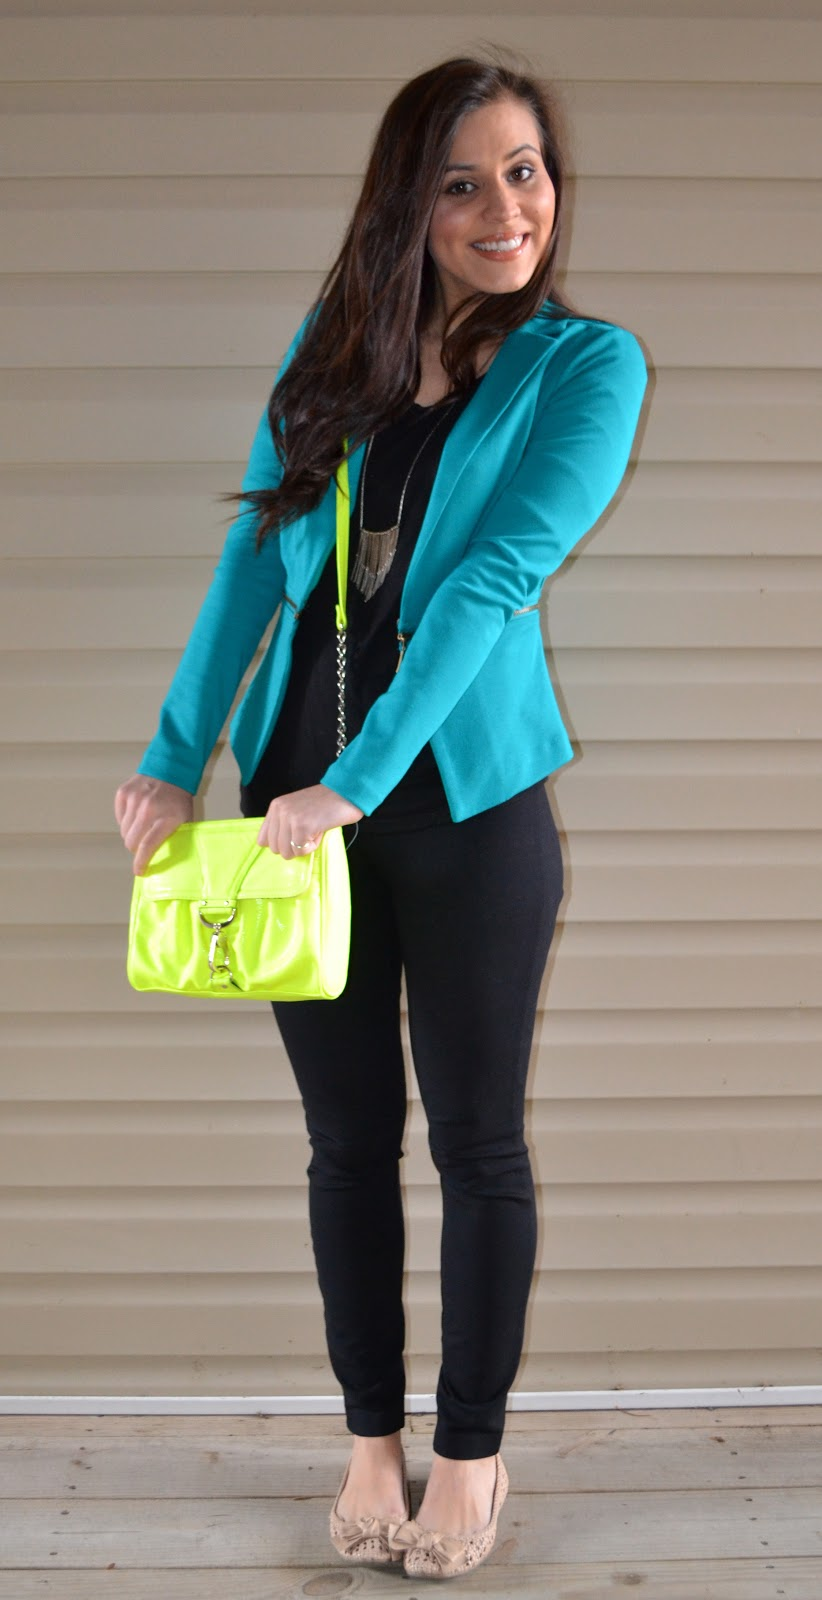 TealConrad Teal Blazer -- $29.99, Target. | Black top -- $12.99, H&M. | Pixie Pants -- $80.00, J.Crew. | Bow flats -- $10.00, LC Lauren Conrad via Khols sale.